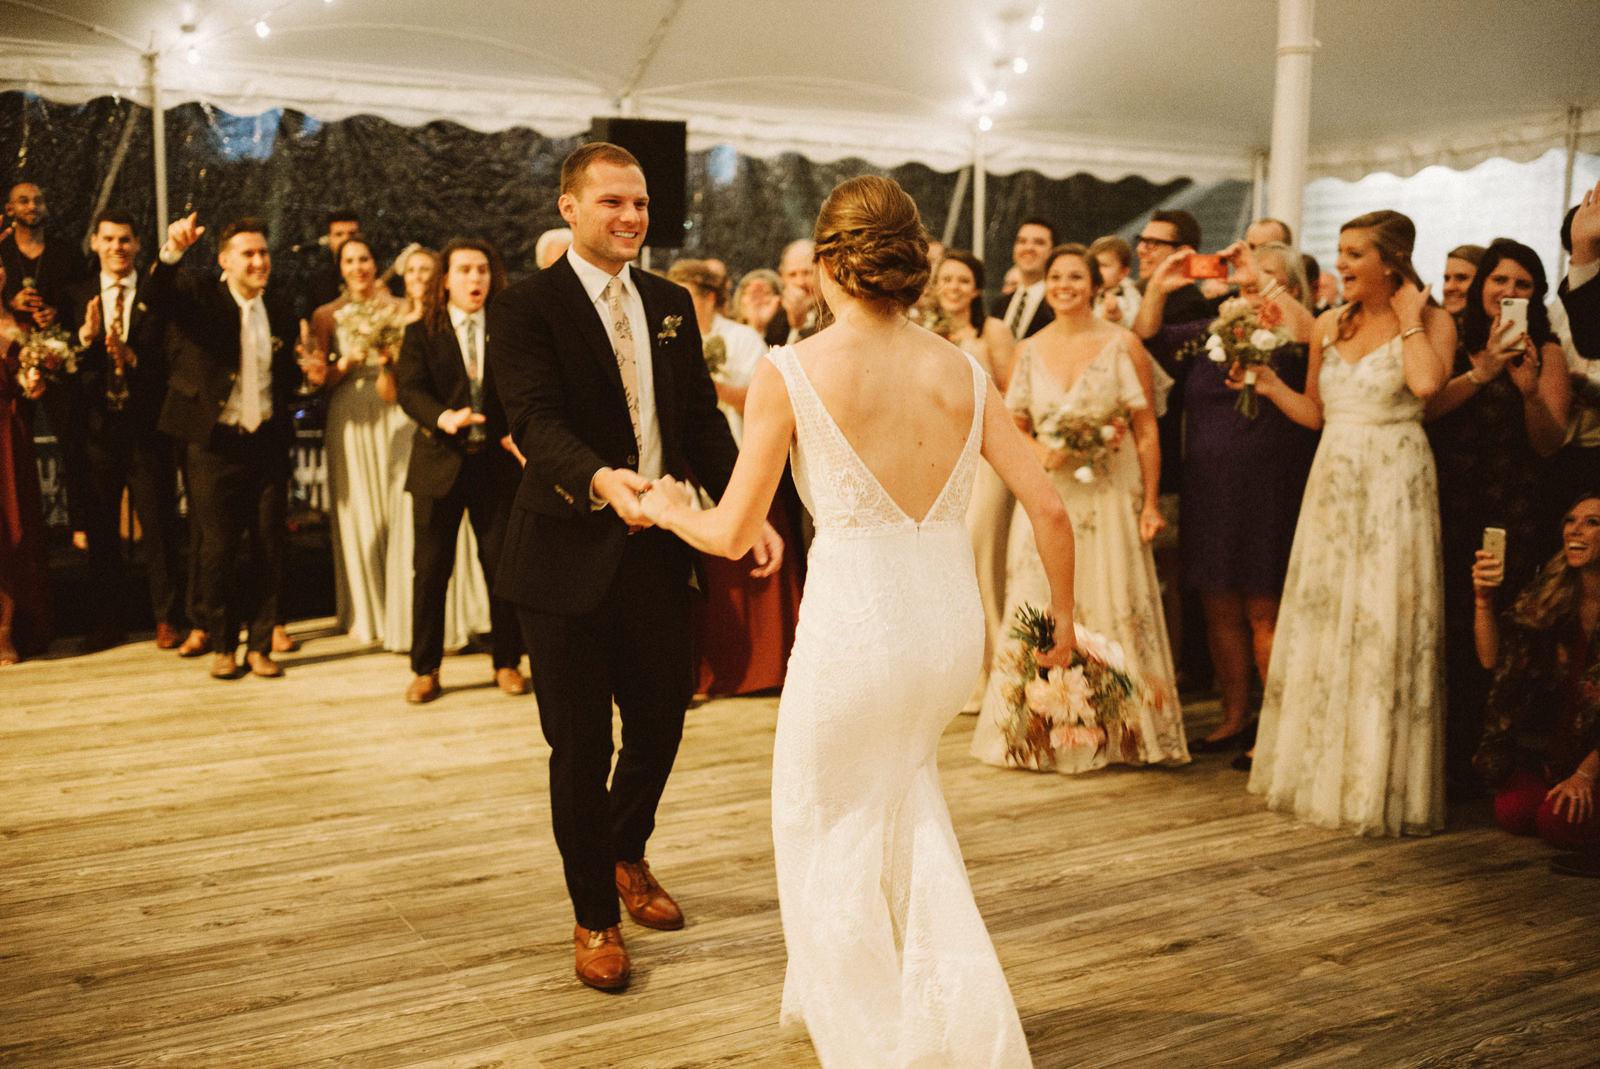 bridgeport-wedding-140 BRIDGEPORT, CONNECTICUT BACKYARD WEDDING